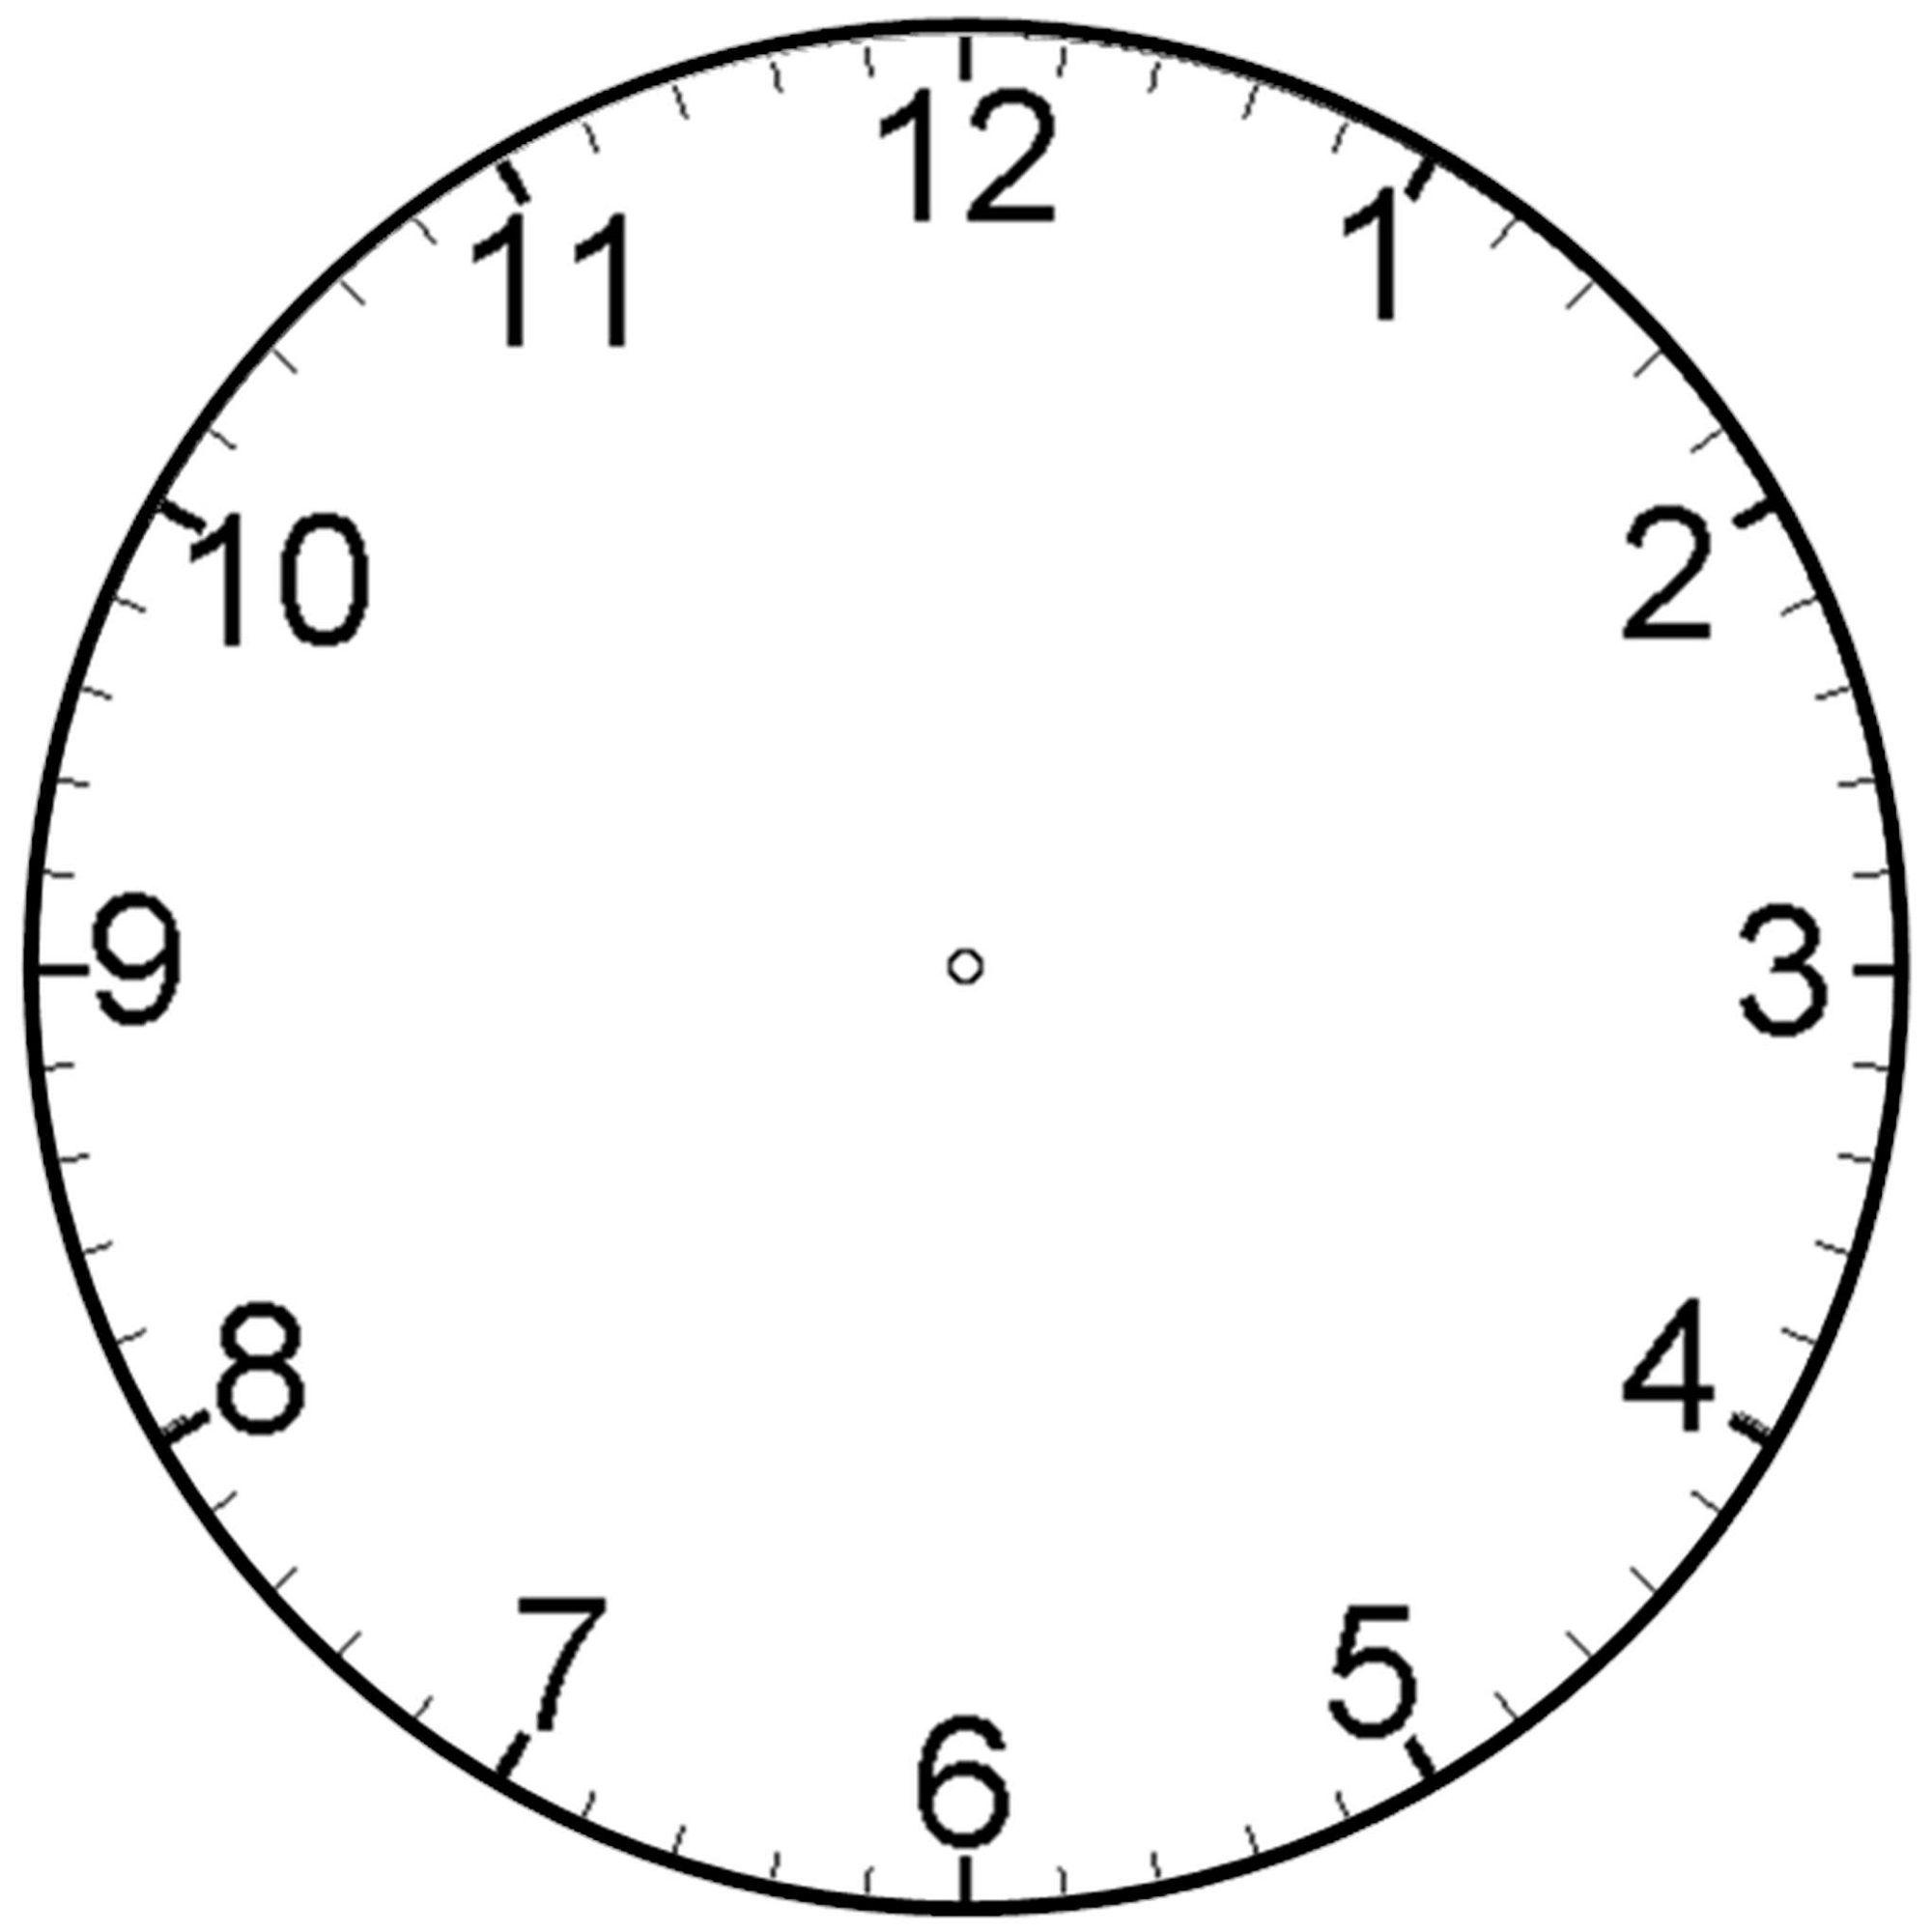 Clock Face Printable For Media Reading Clock